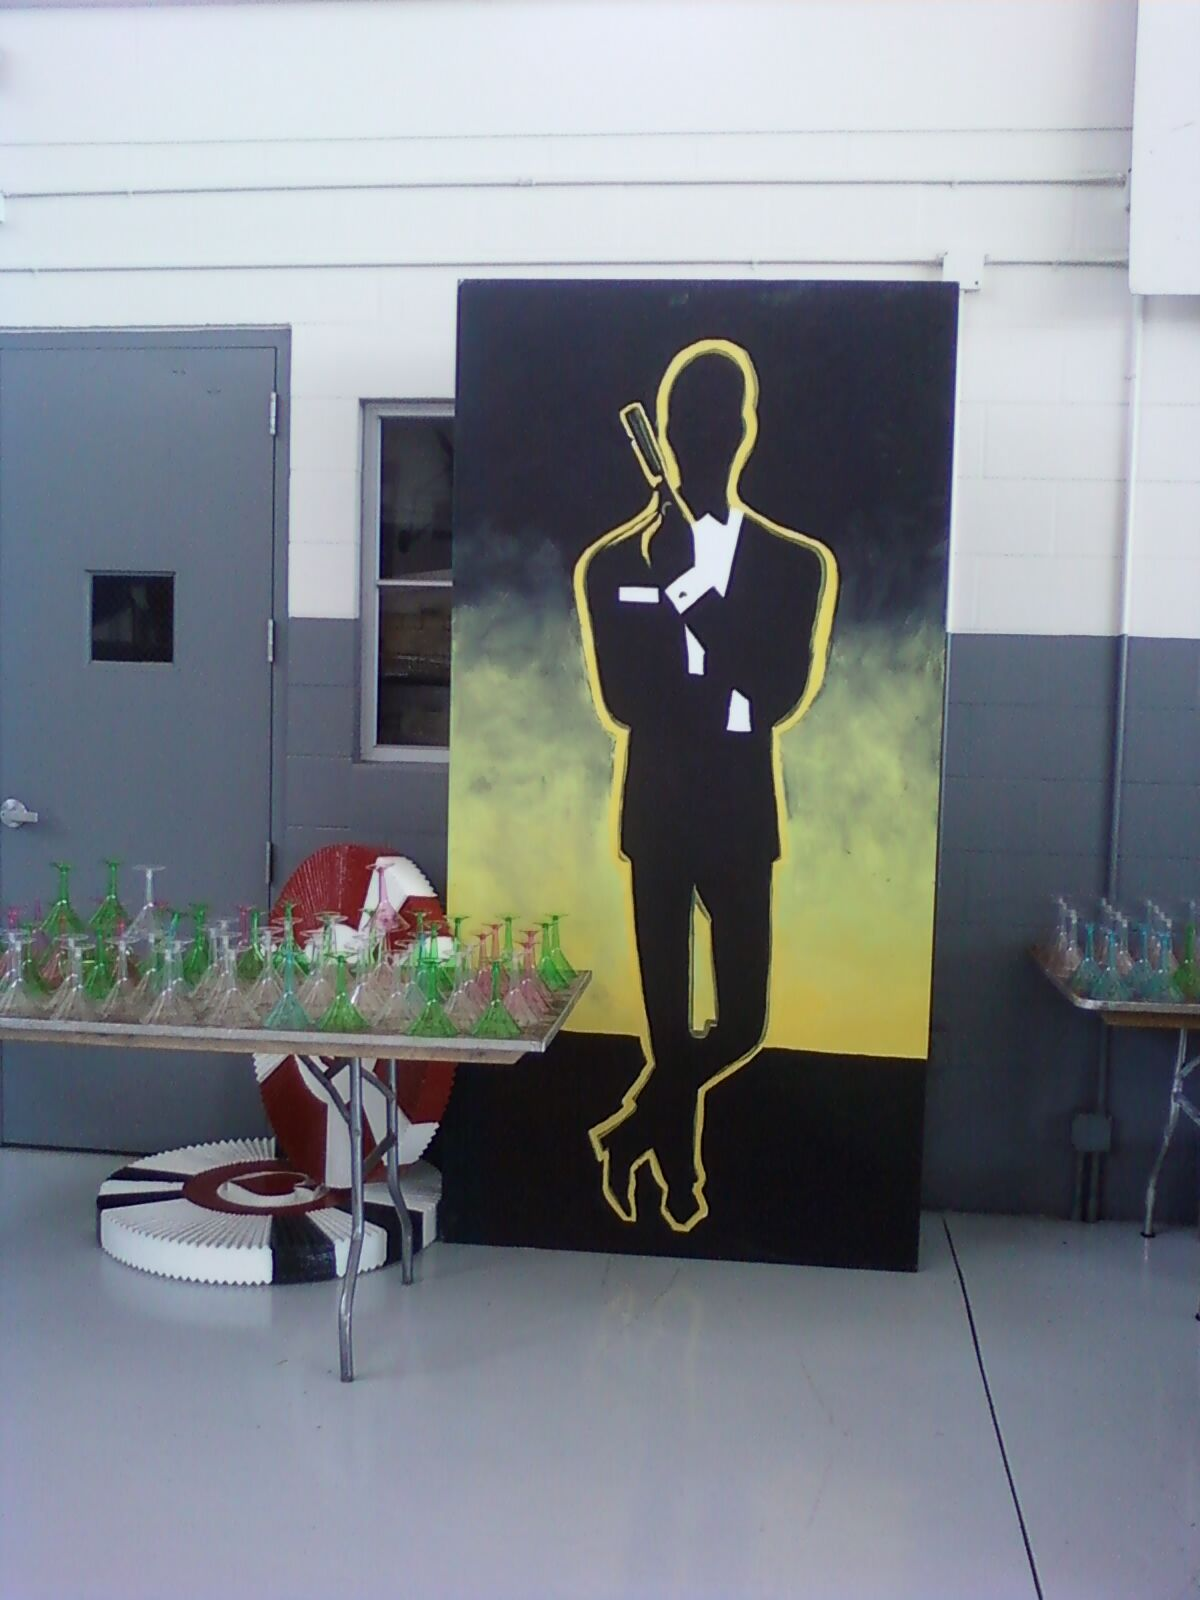 Bond Mural and Casino Chips  #FLeventdecor